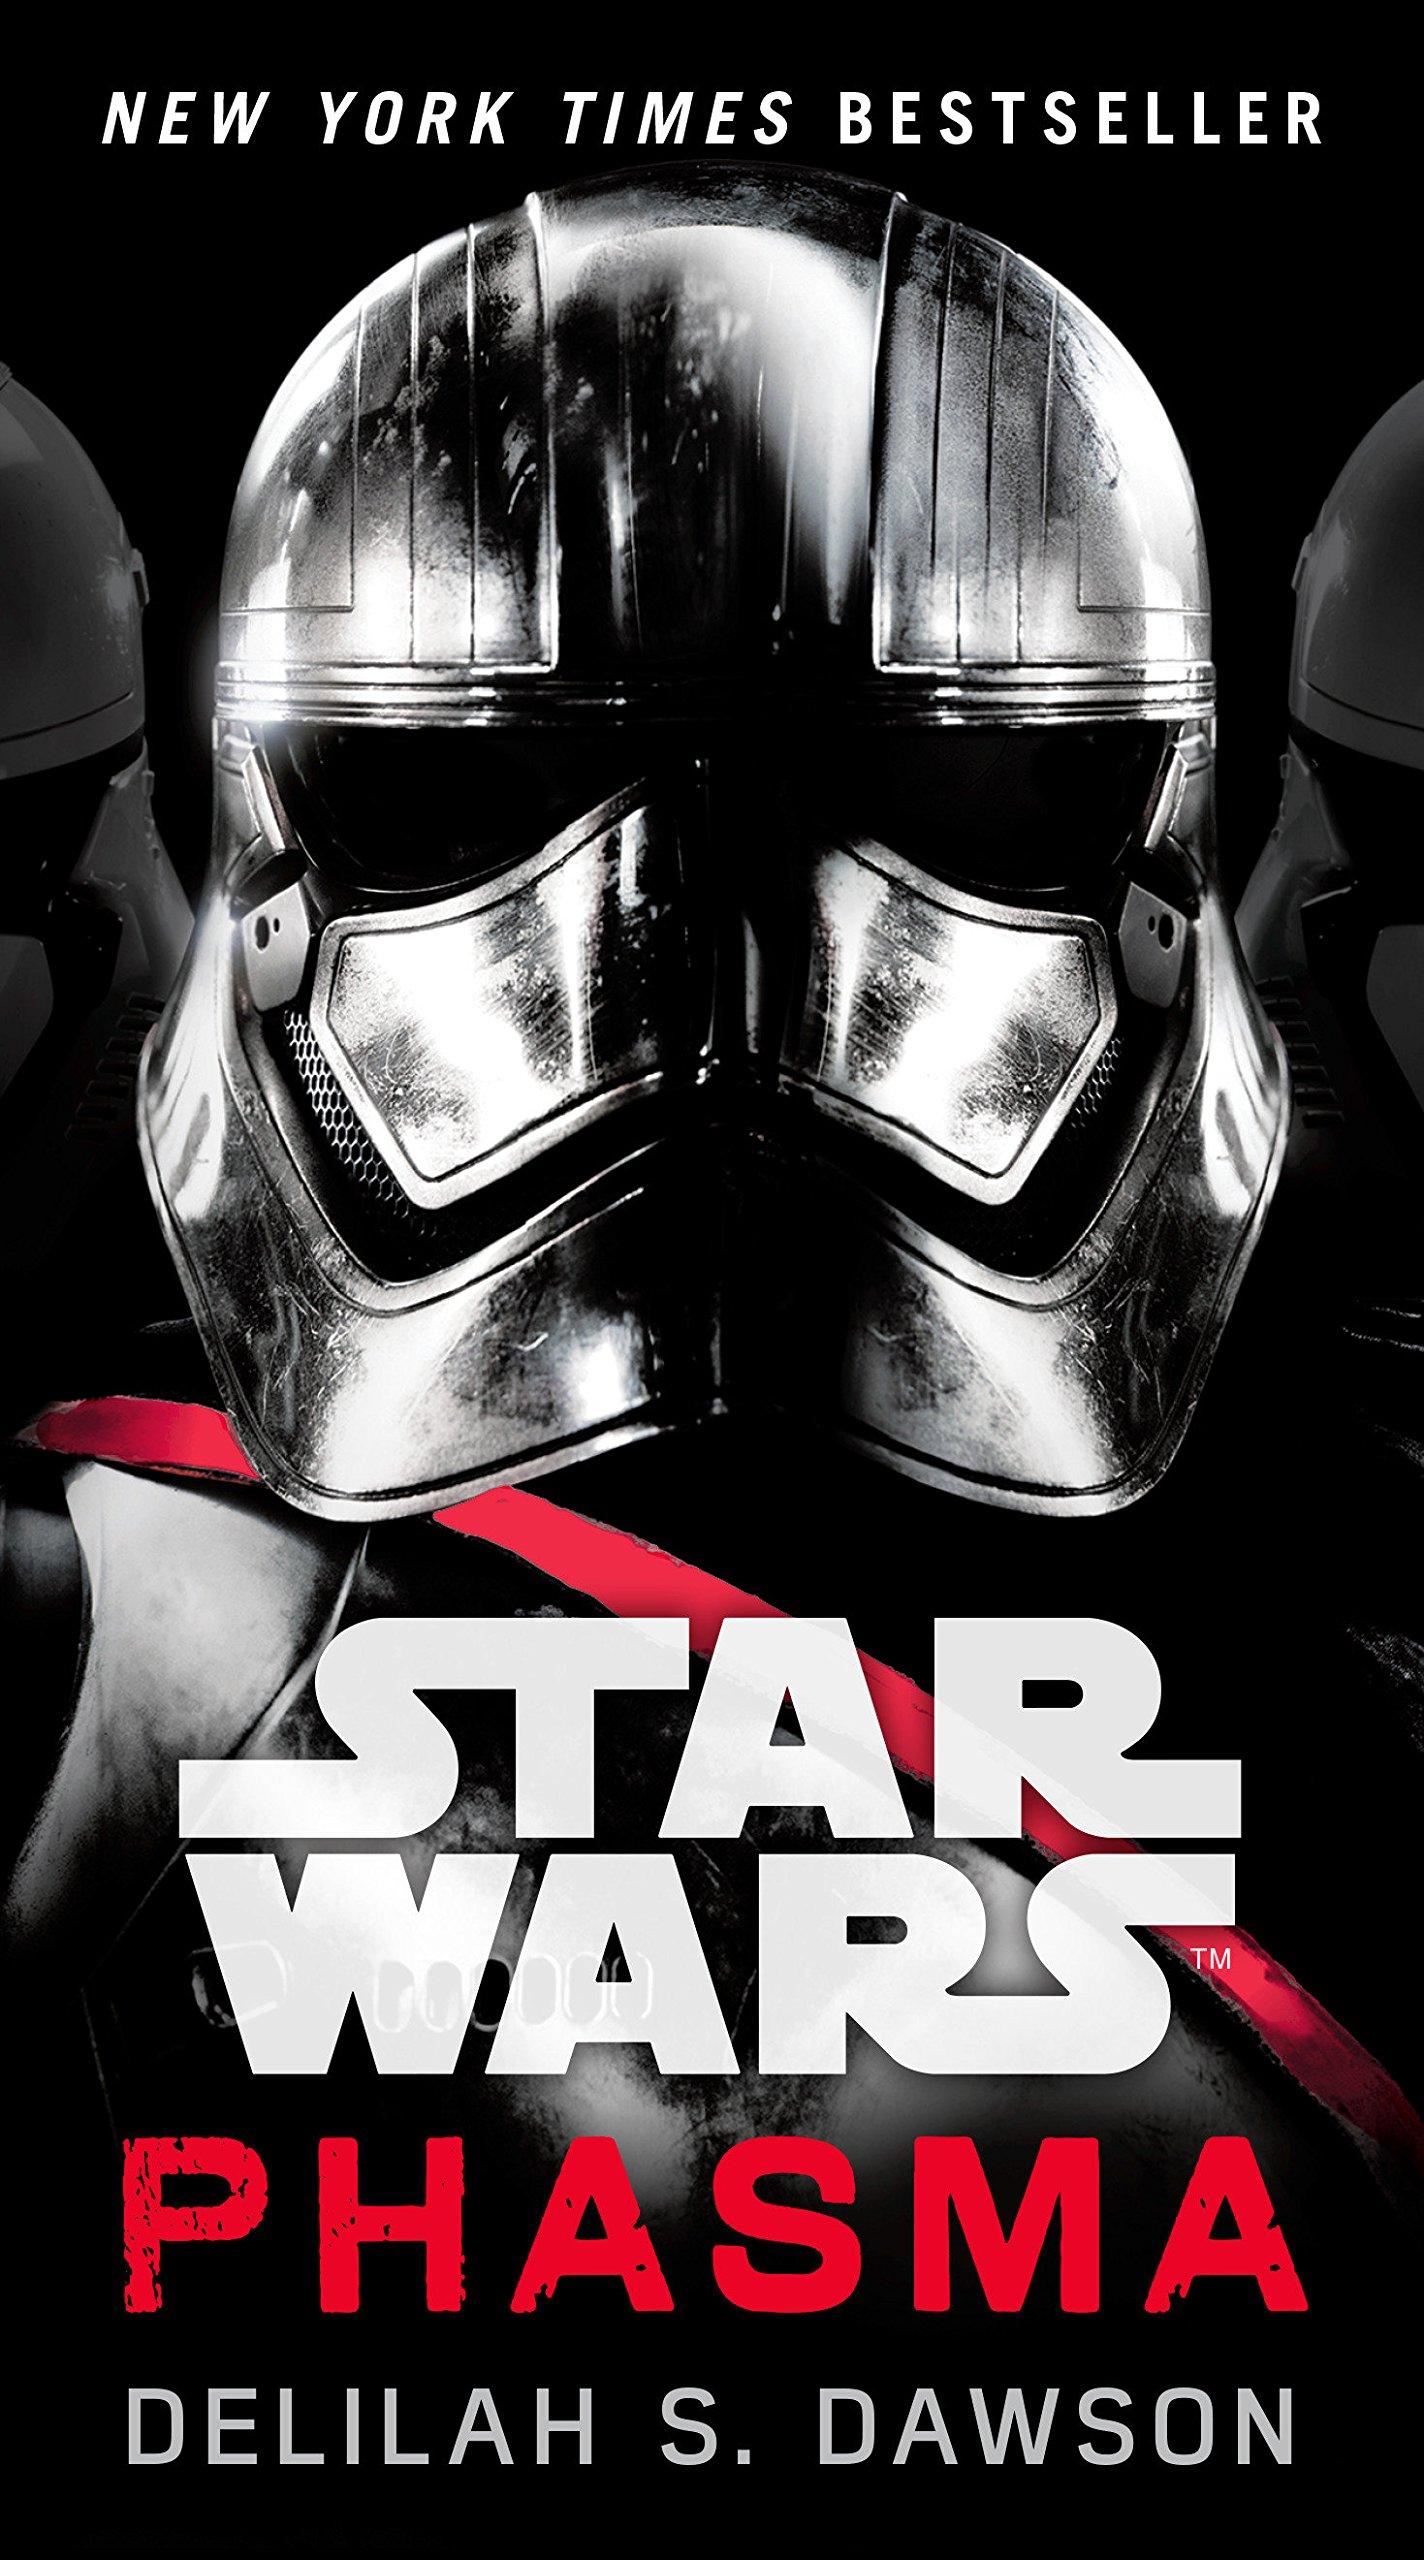 the best star wars books